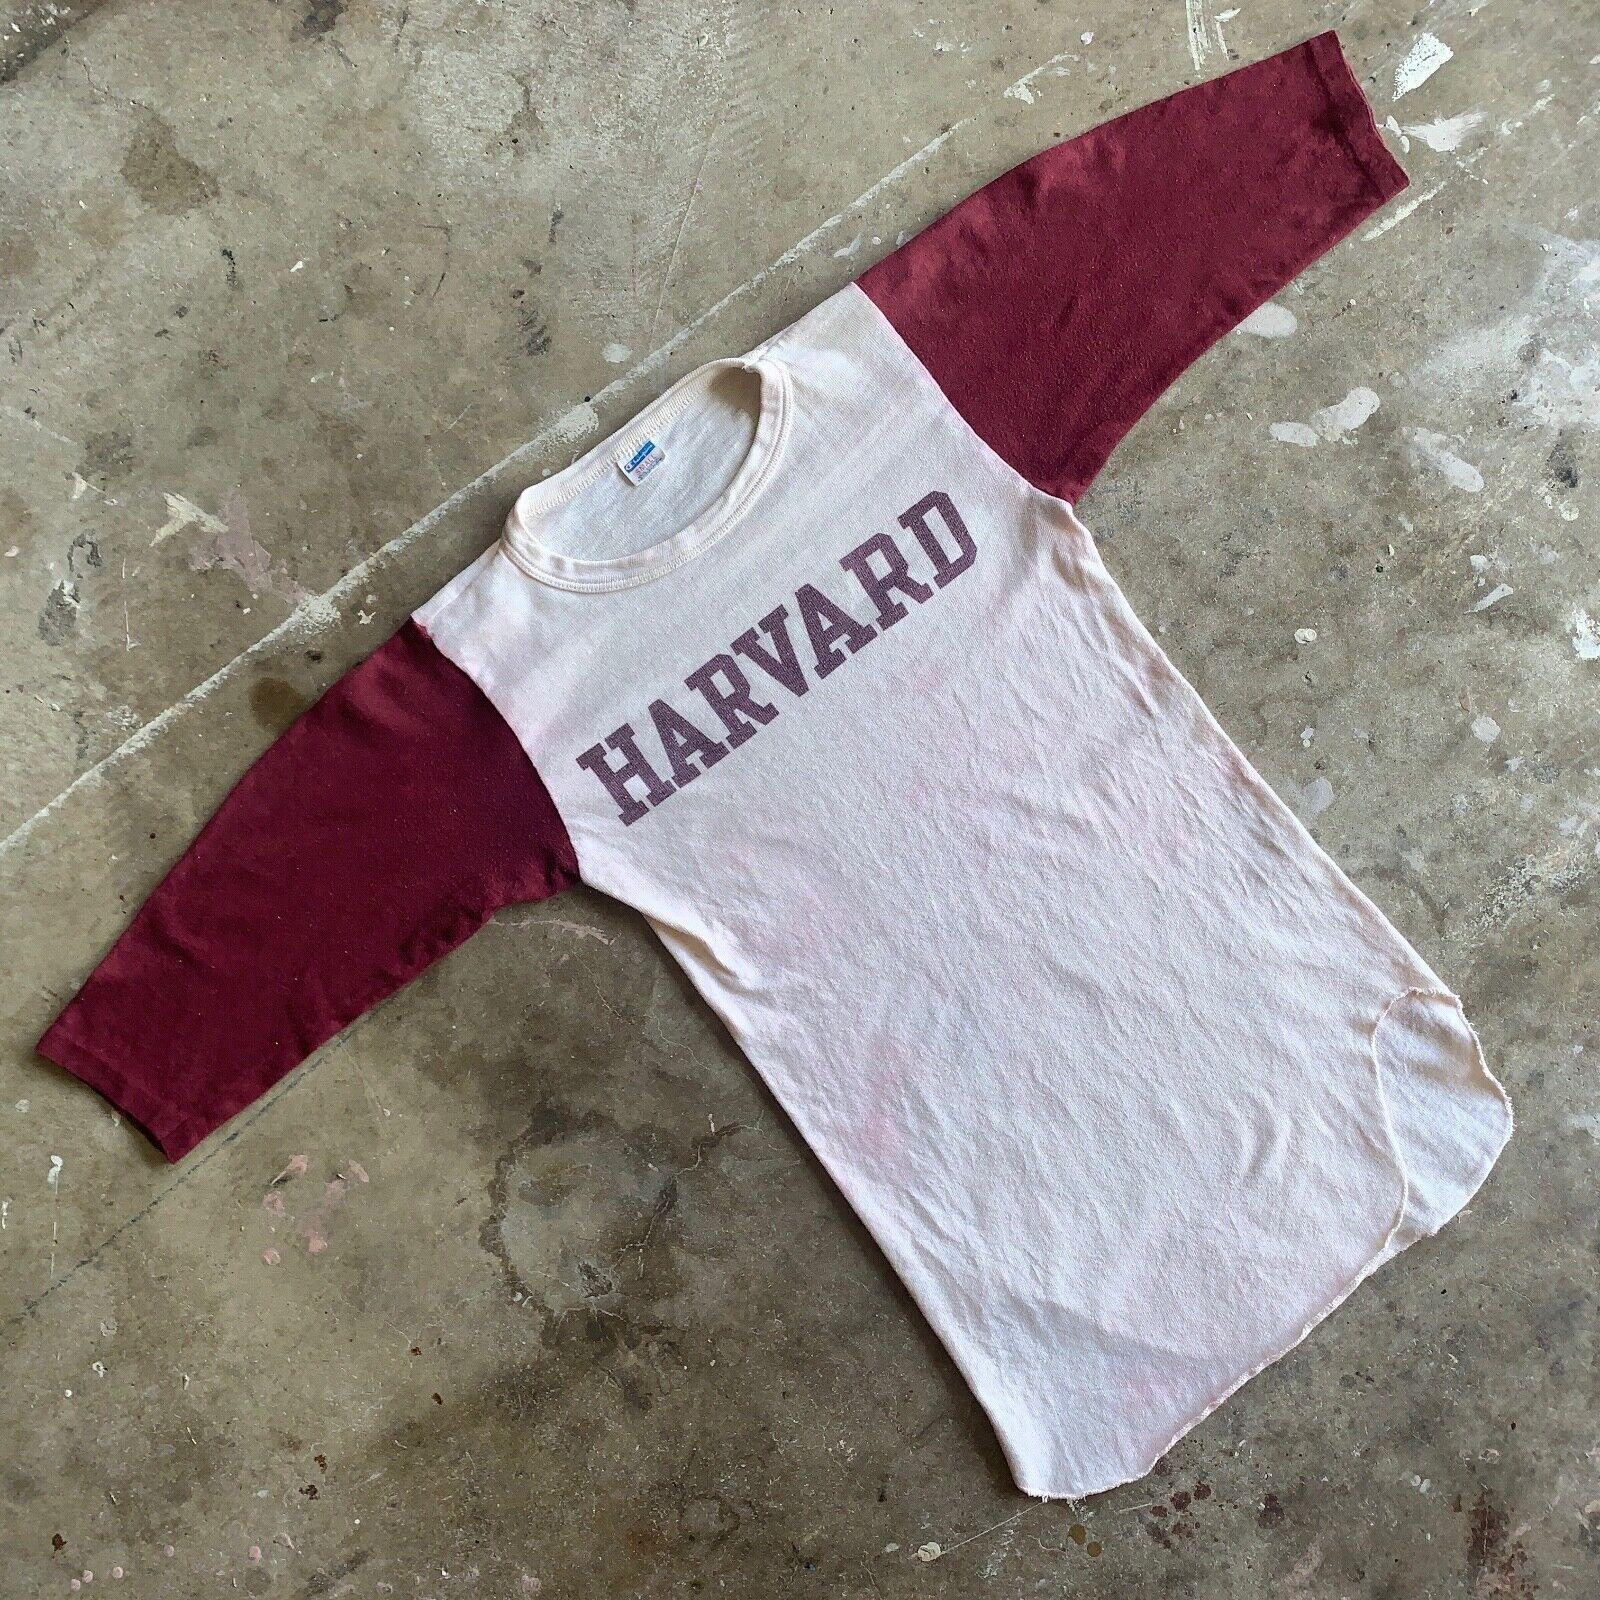 70s VINTAGE HARVARD UNIVERSITY RAGLAN T-SHIRT SZ … - image 3